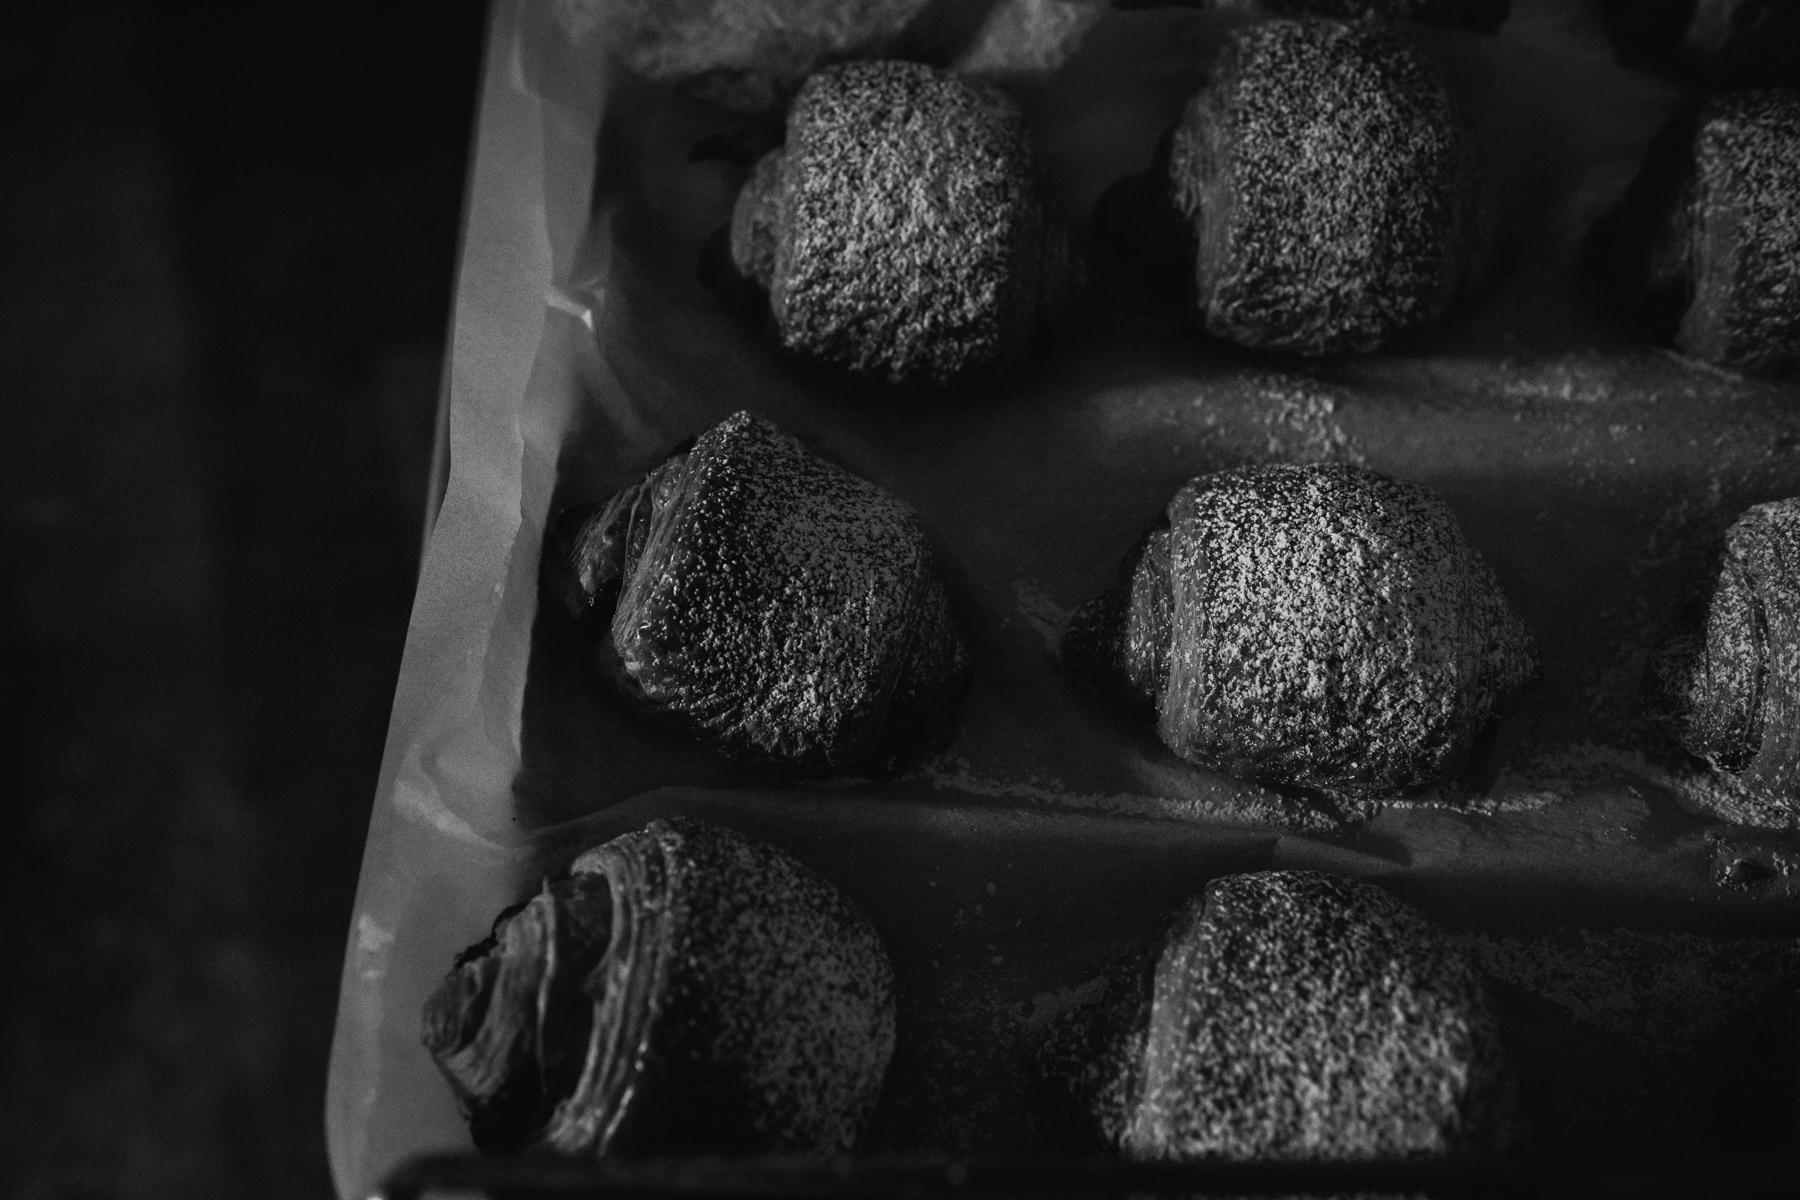 matt-tinder-saboteur-bakery-bremerton-wa-35